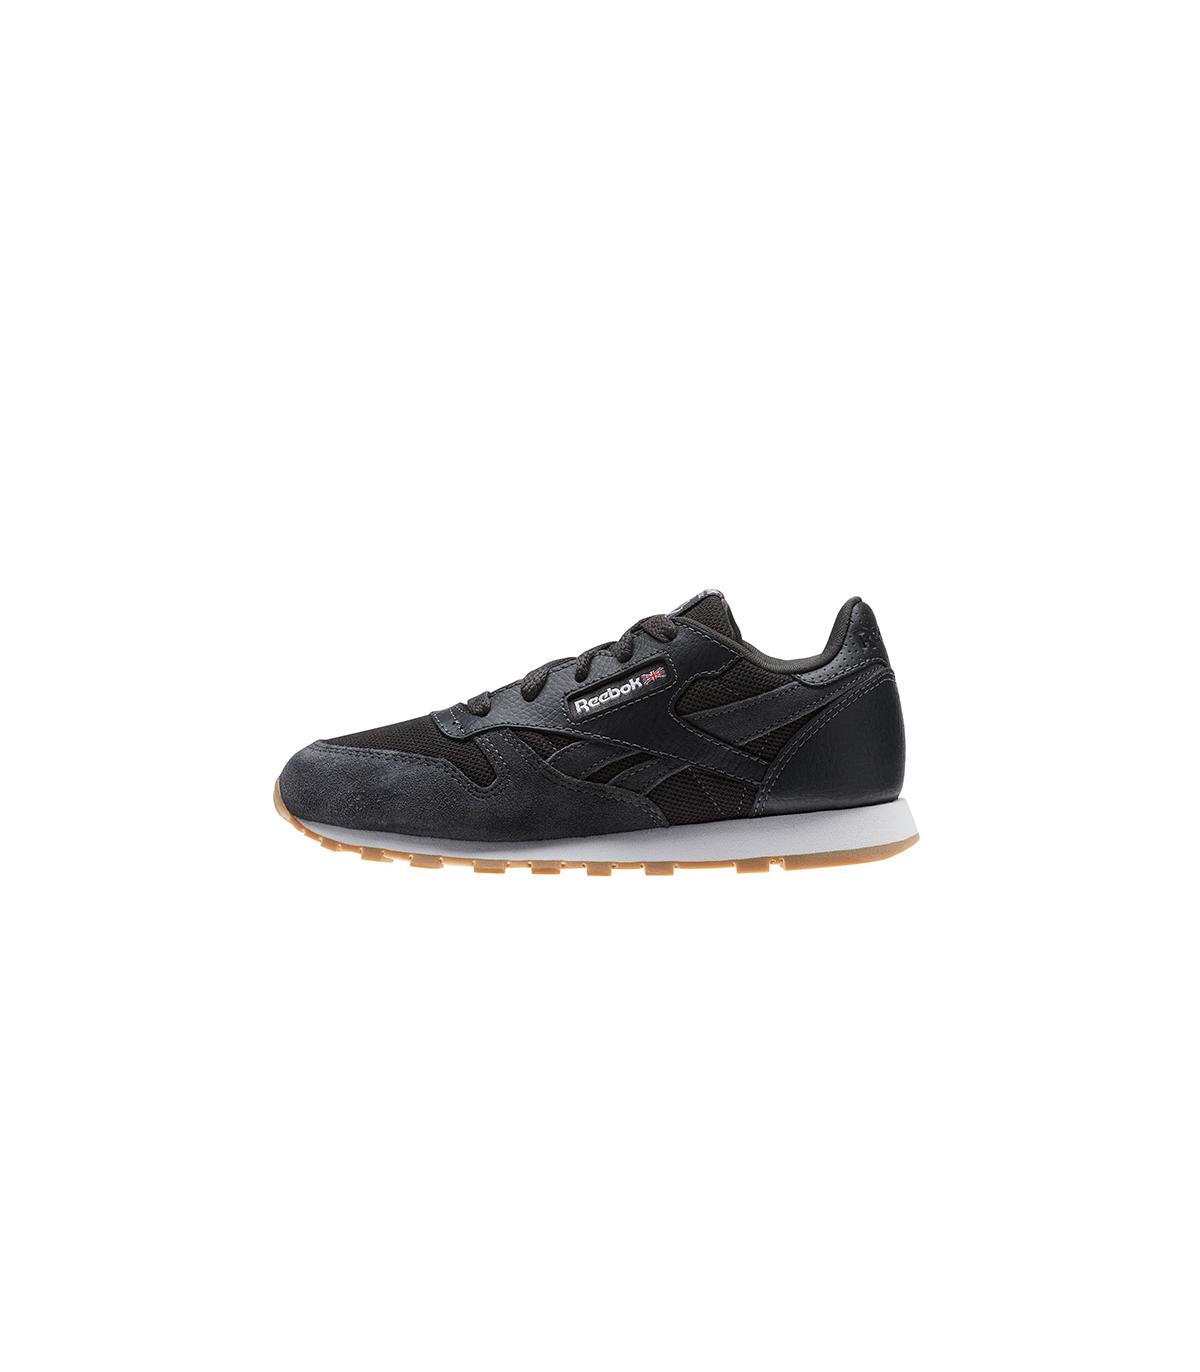 aac9e82ef Zapatillas Reebok Classic Leather Essentials